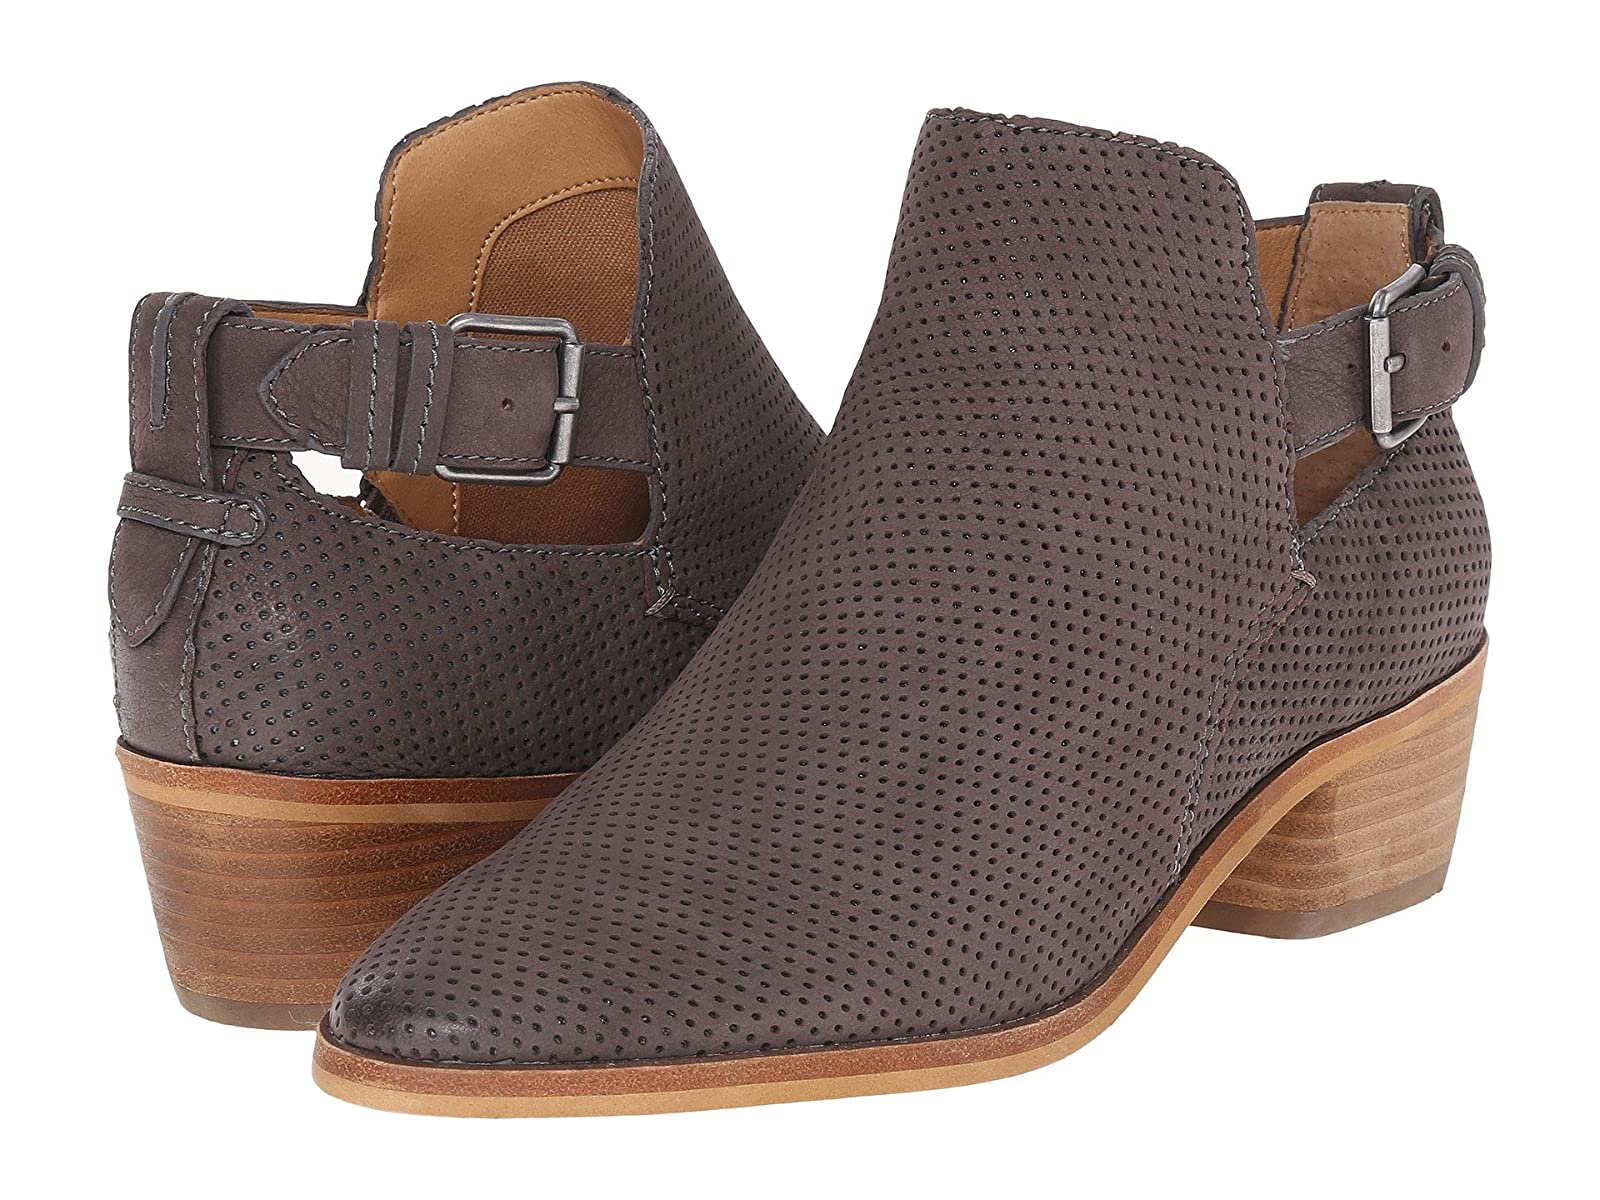 Dolce Vita KaraCheap and distinctive eye-catching shoes